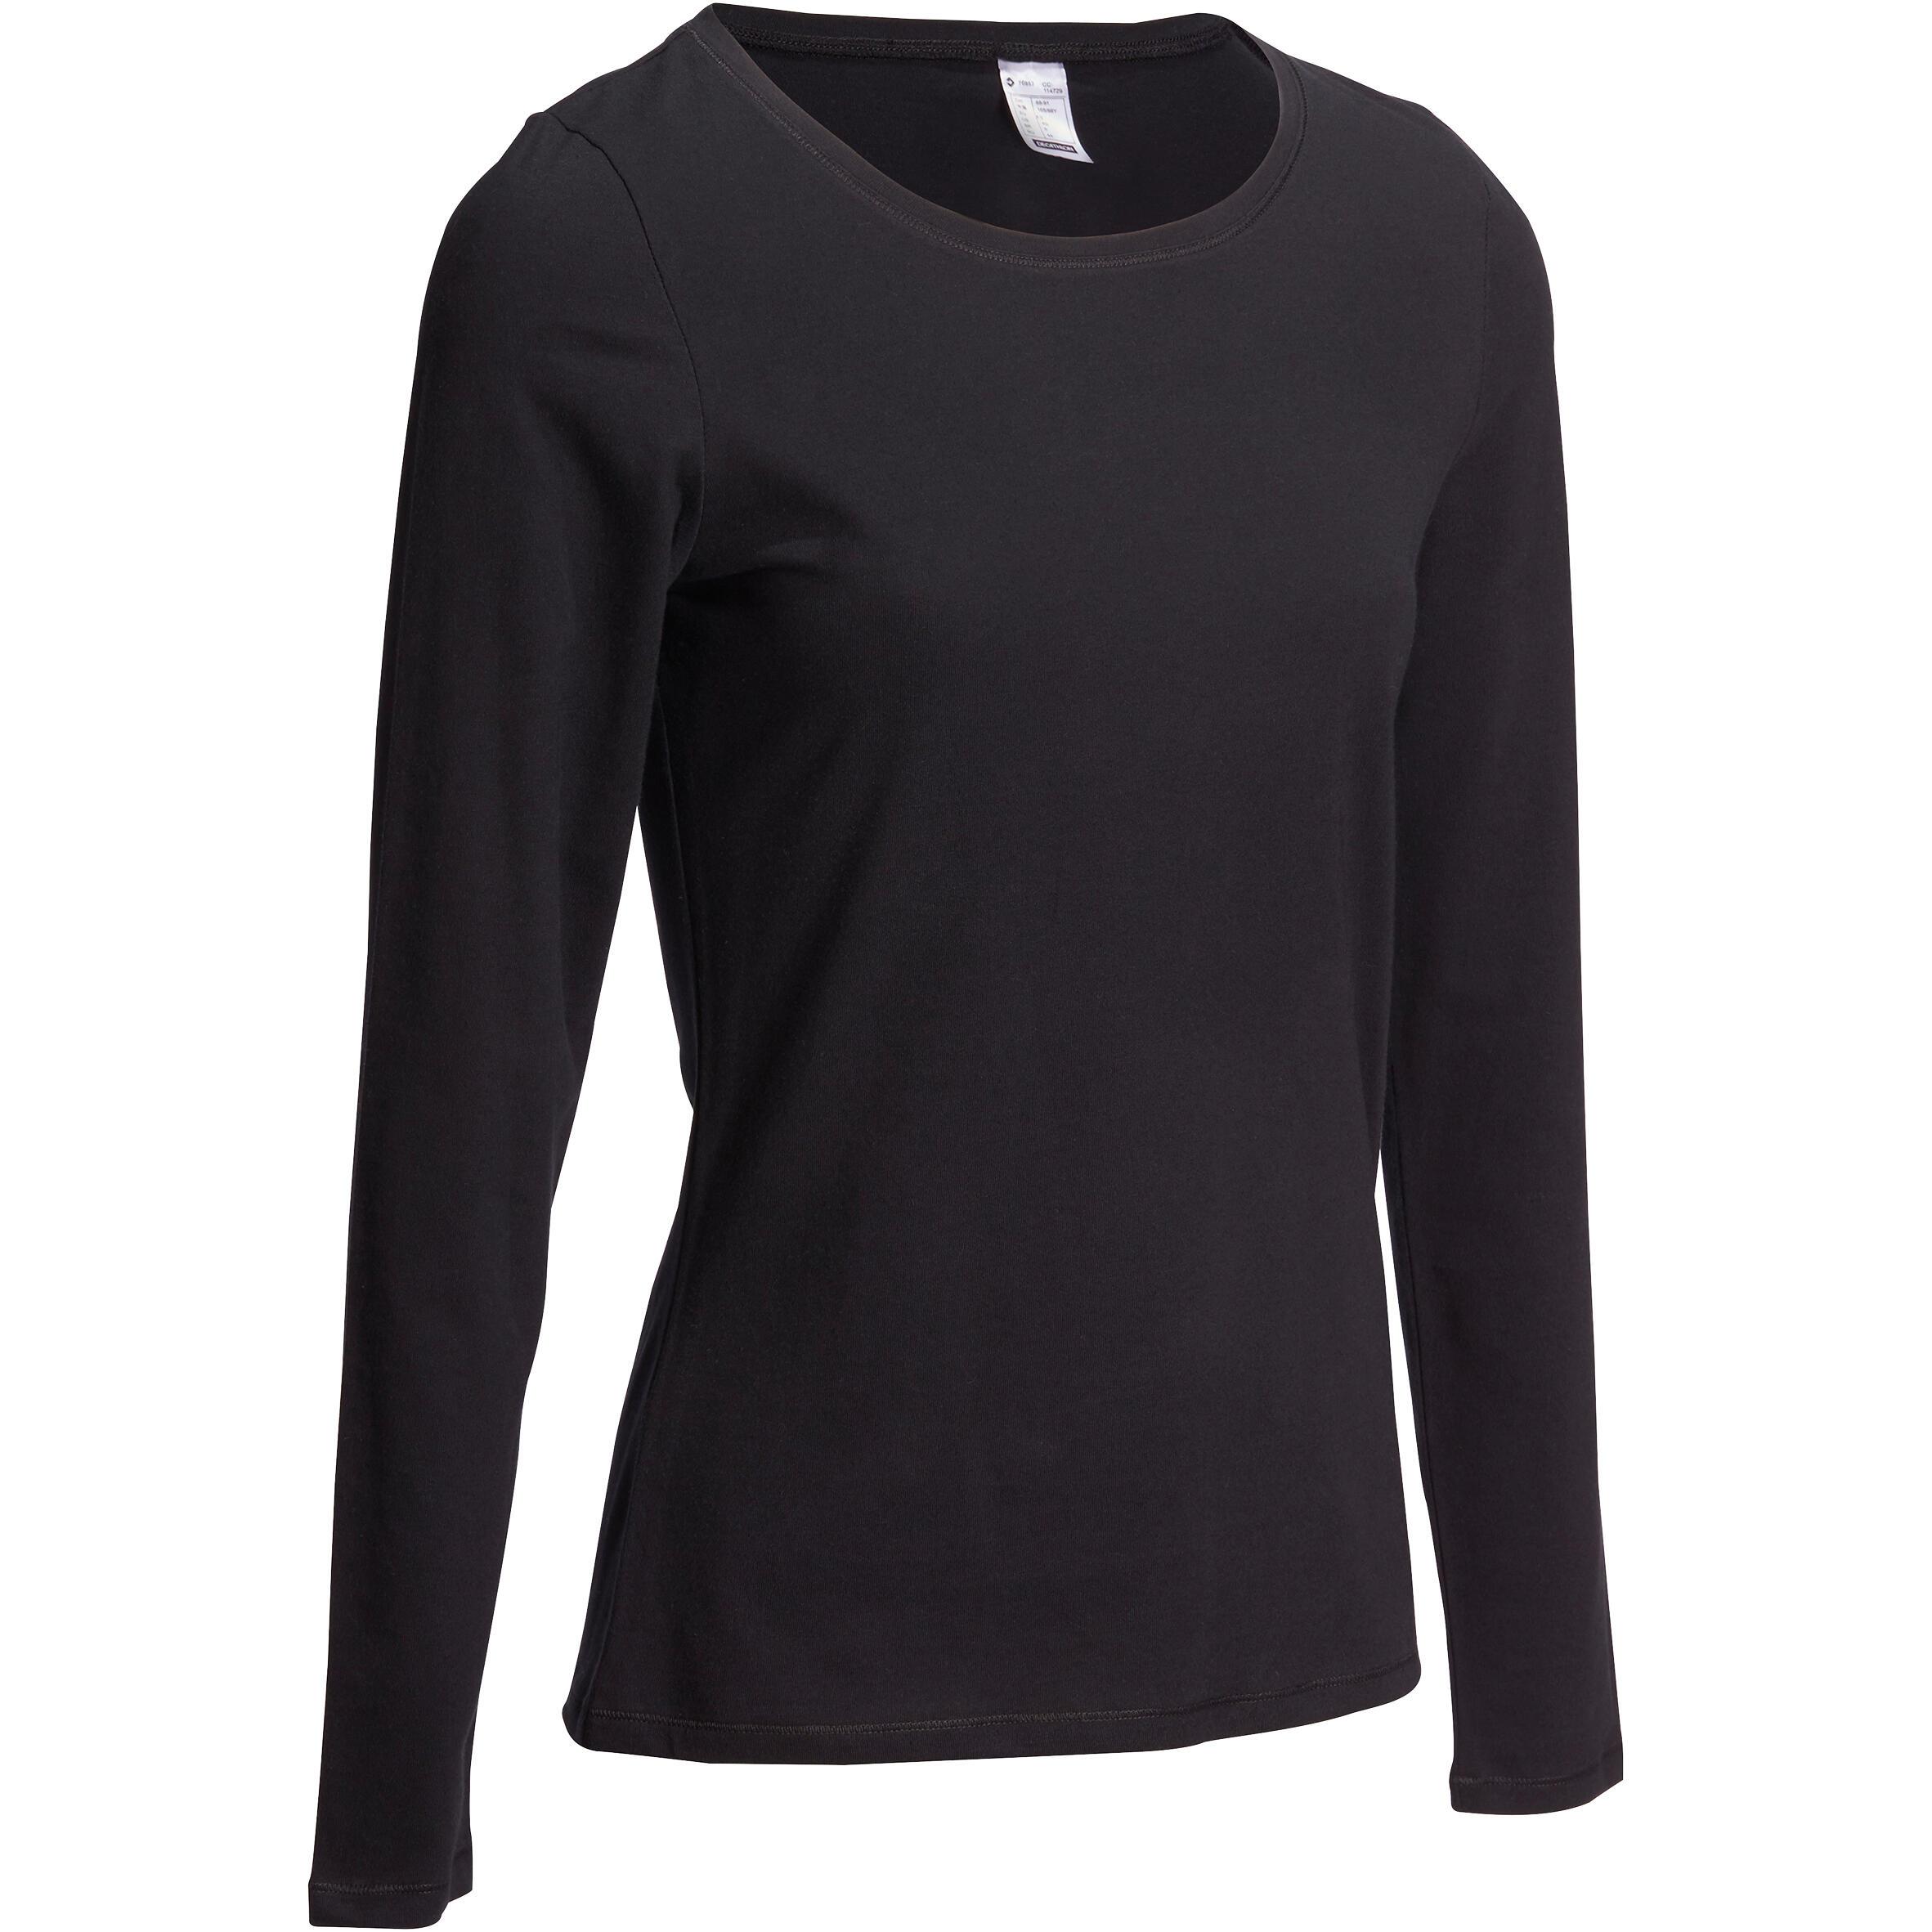 Domyos T-shirt 100 met lange mouwen pilates en lichte gym dames zwart